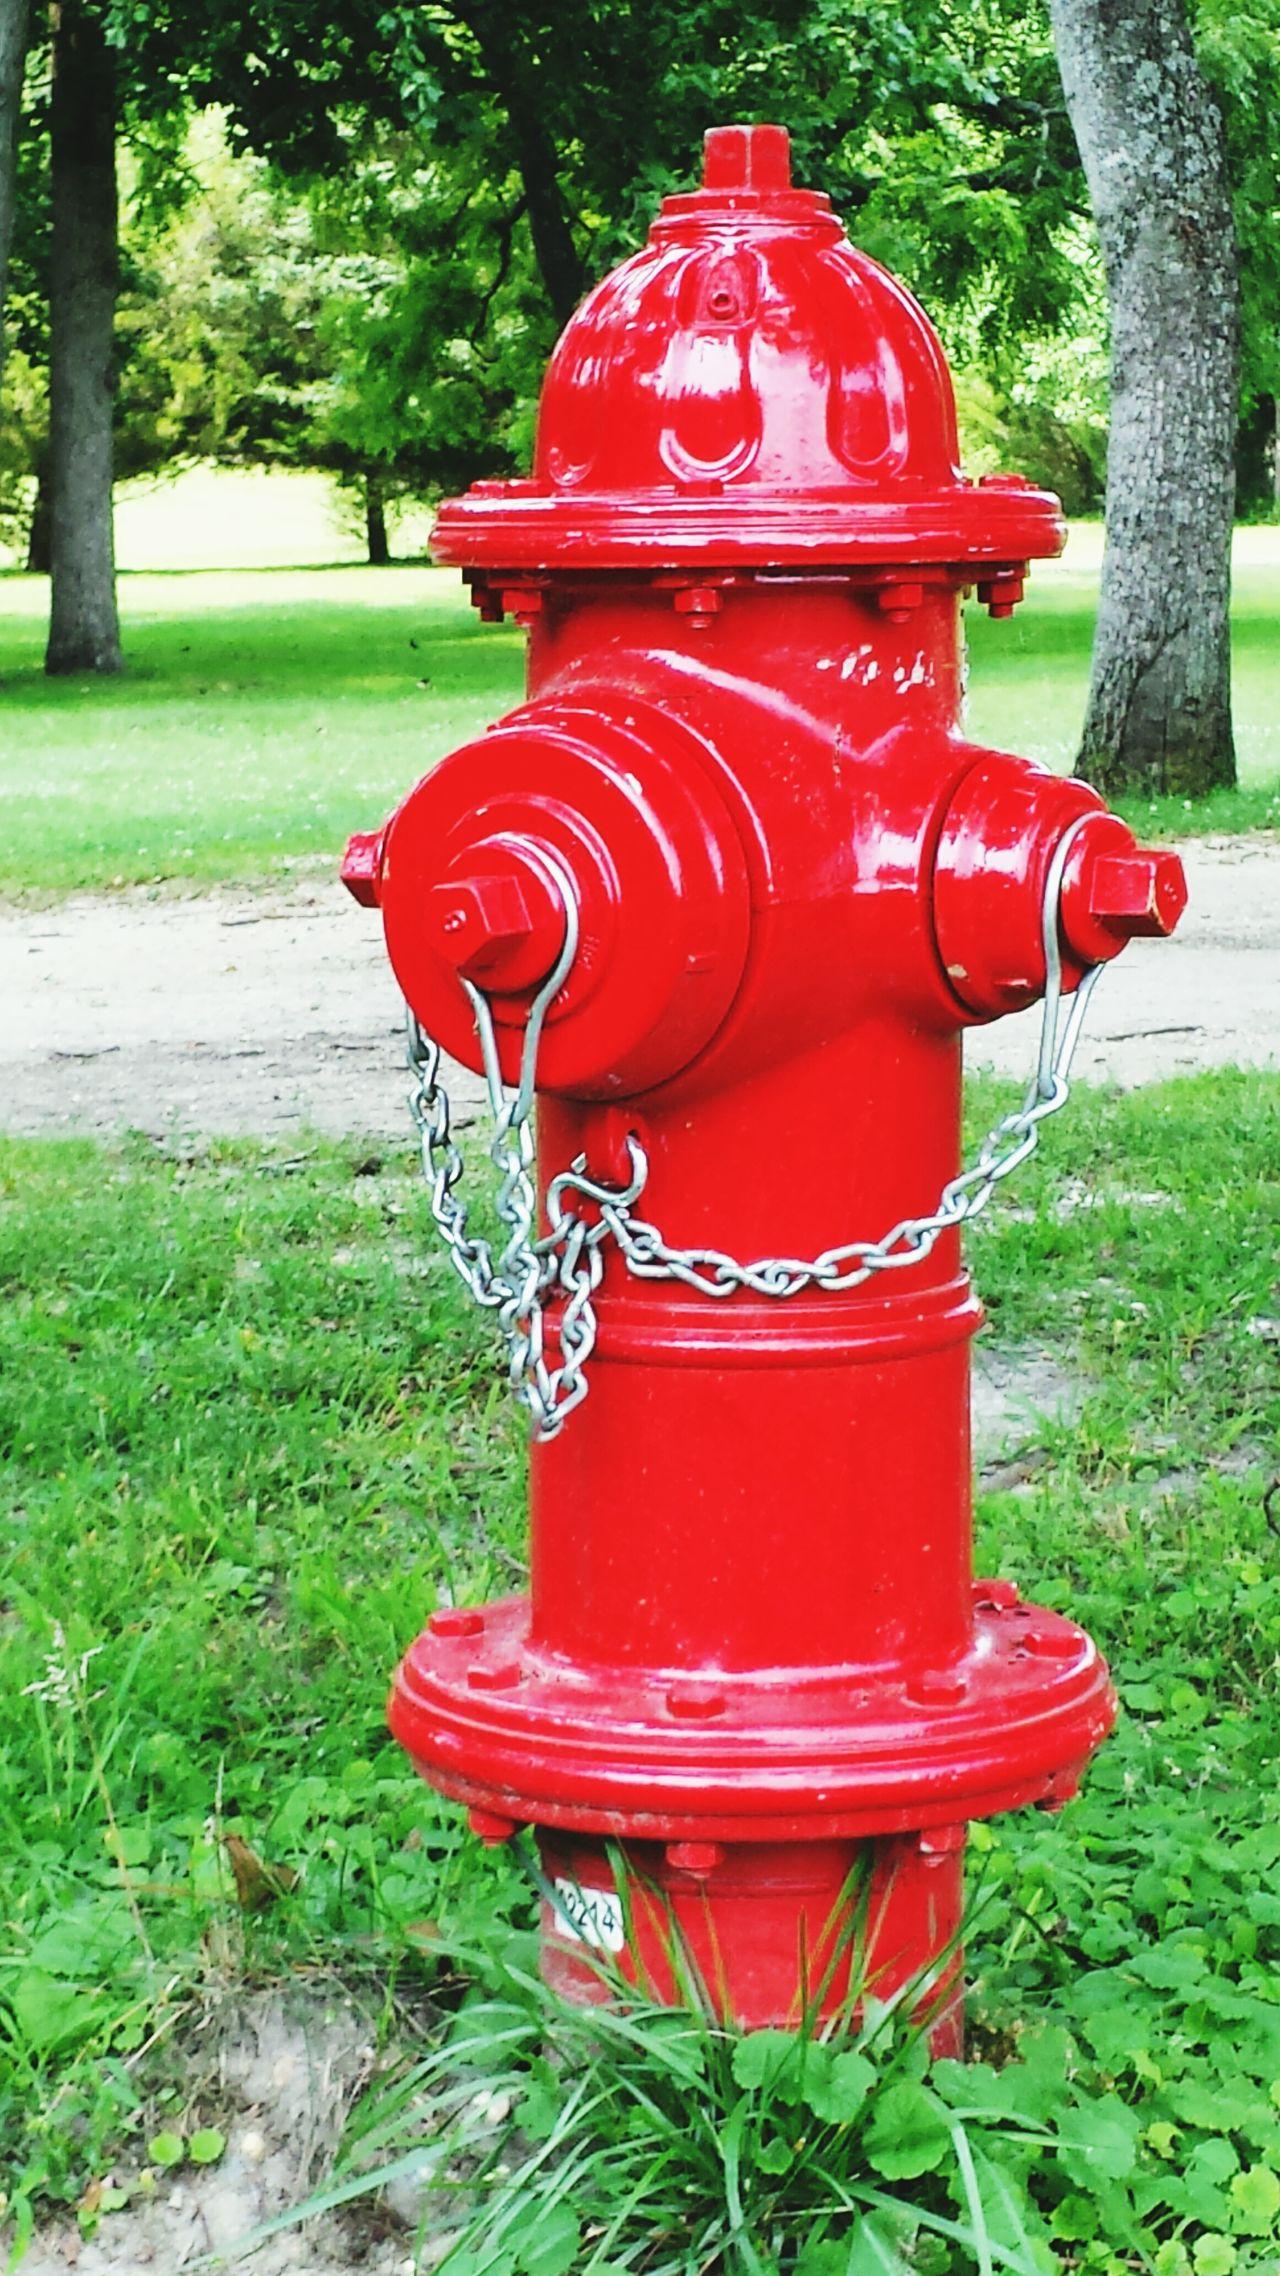 Fire Hydrant Taking Photos Interesting Wharton Park Popular Fun Nature Relaxing Artistic EyeEm Best Shots